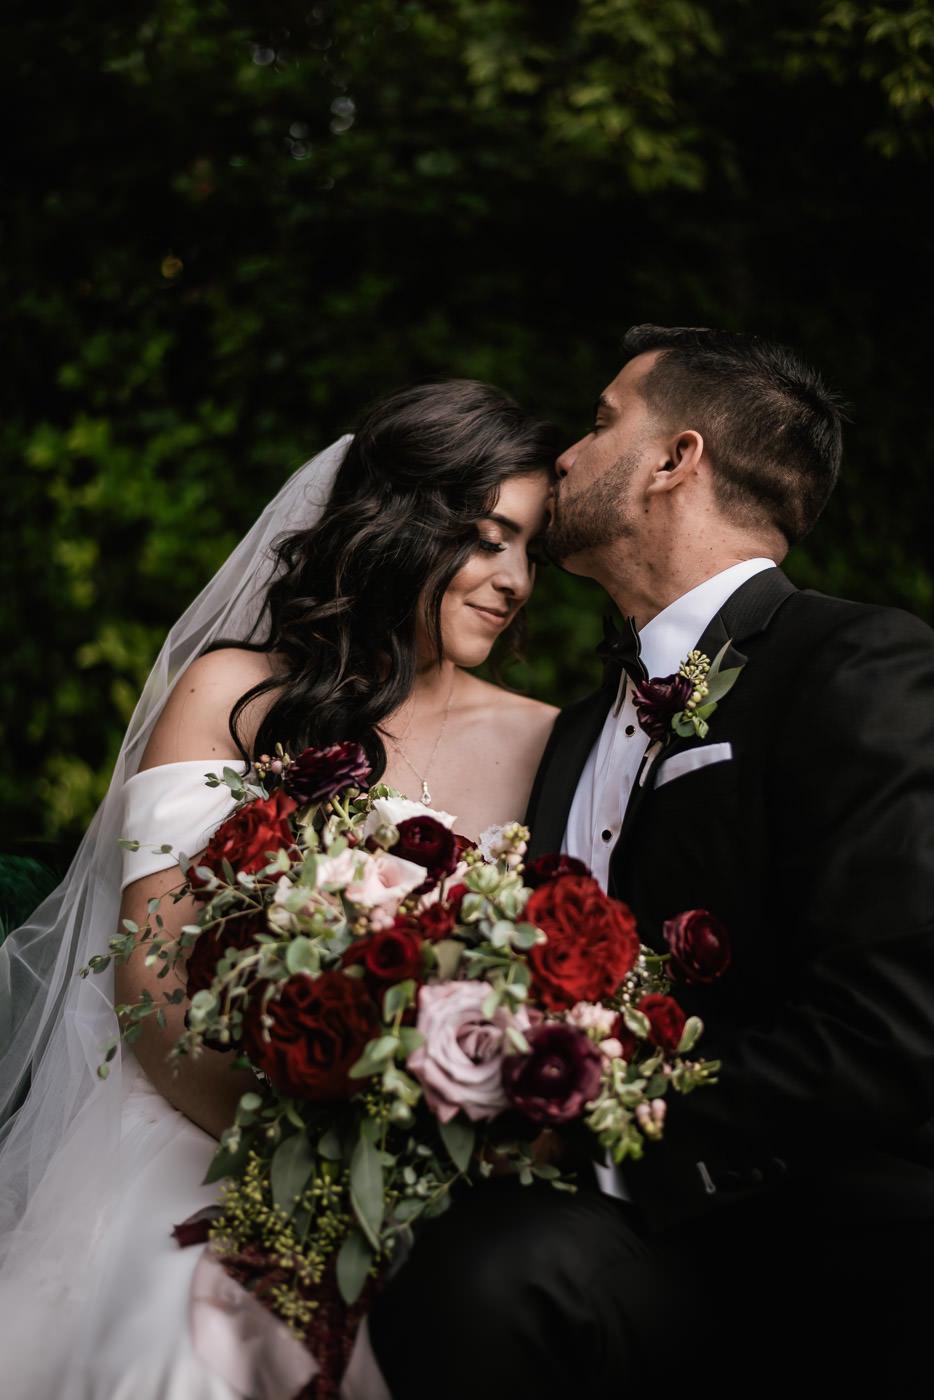 eden-gardens-wedding-photographer-romantic-65.jpg